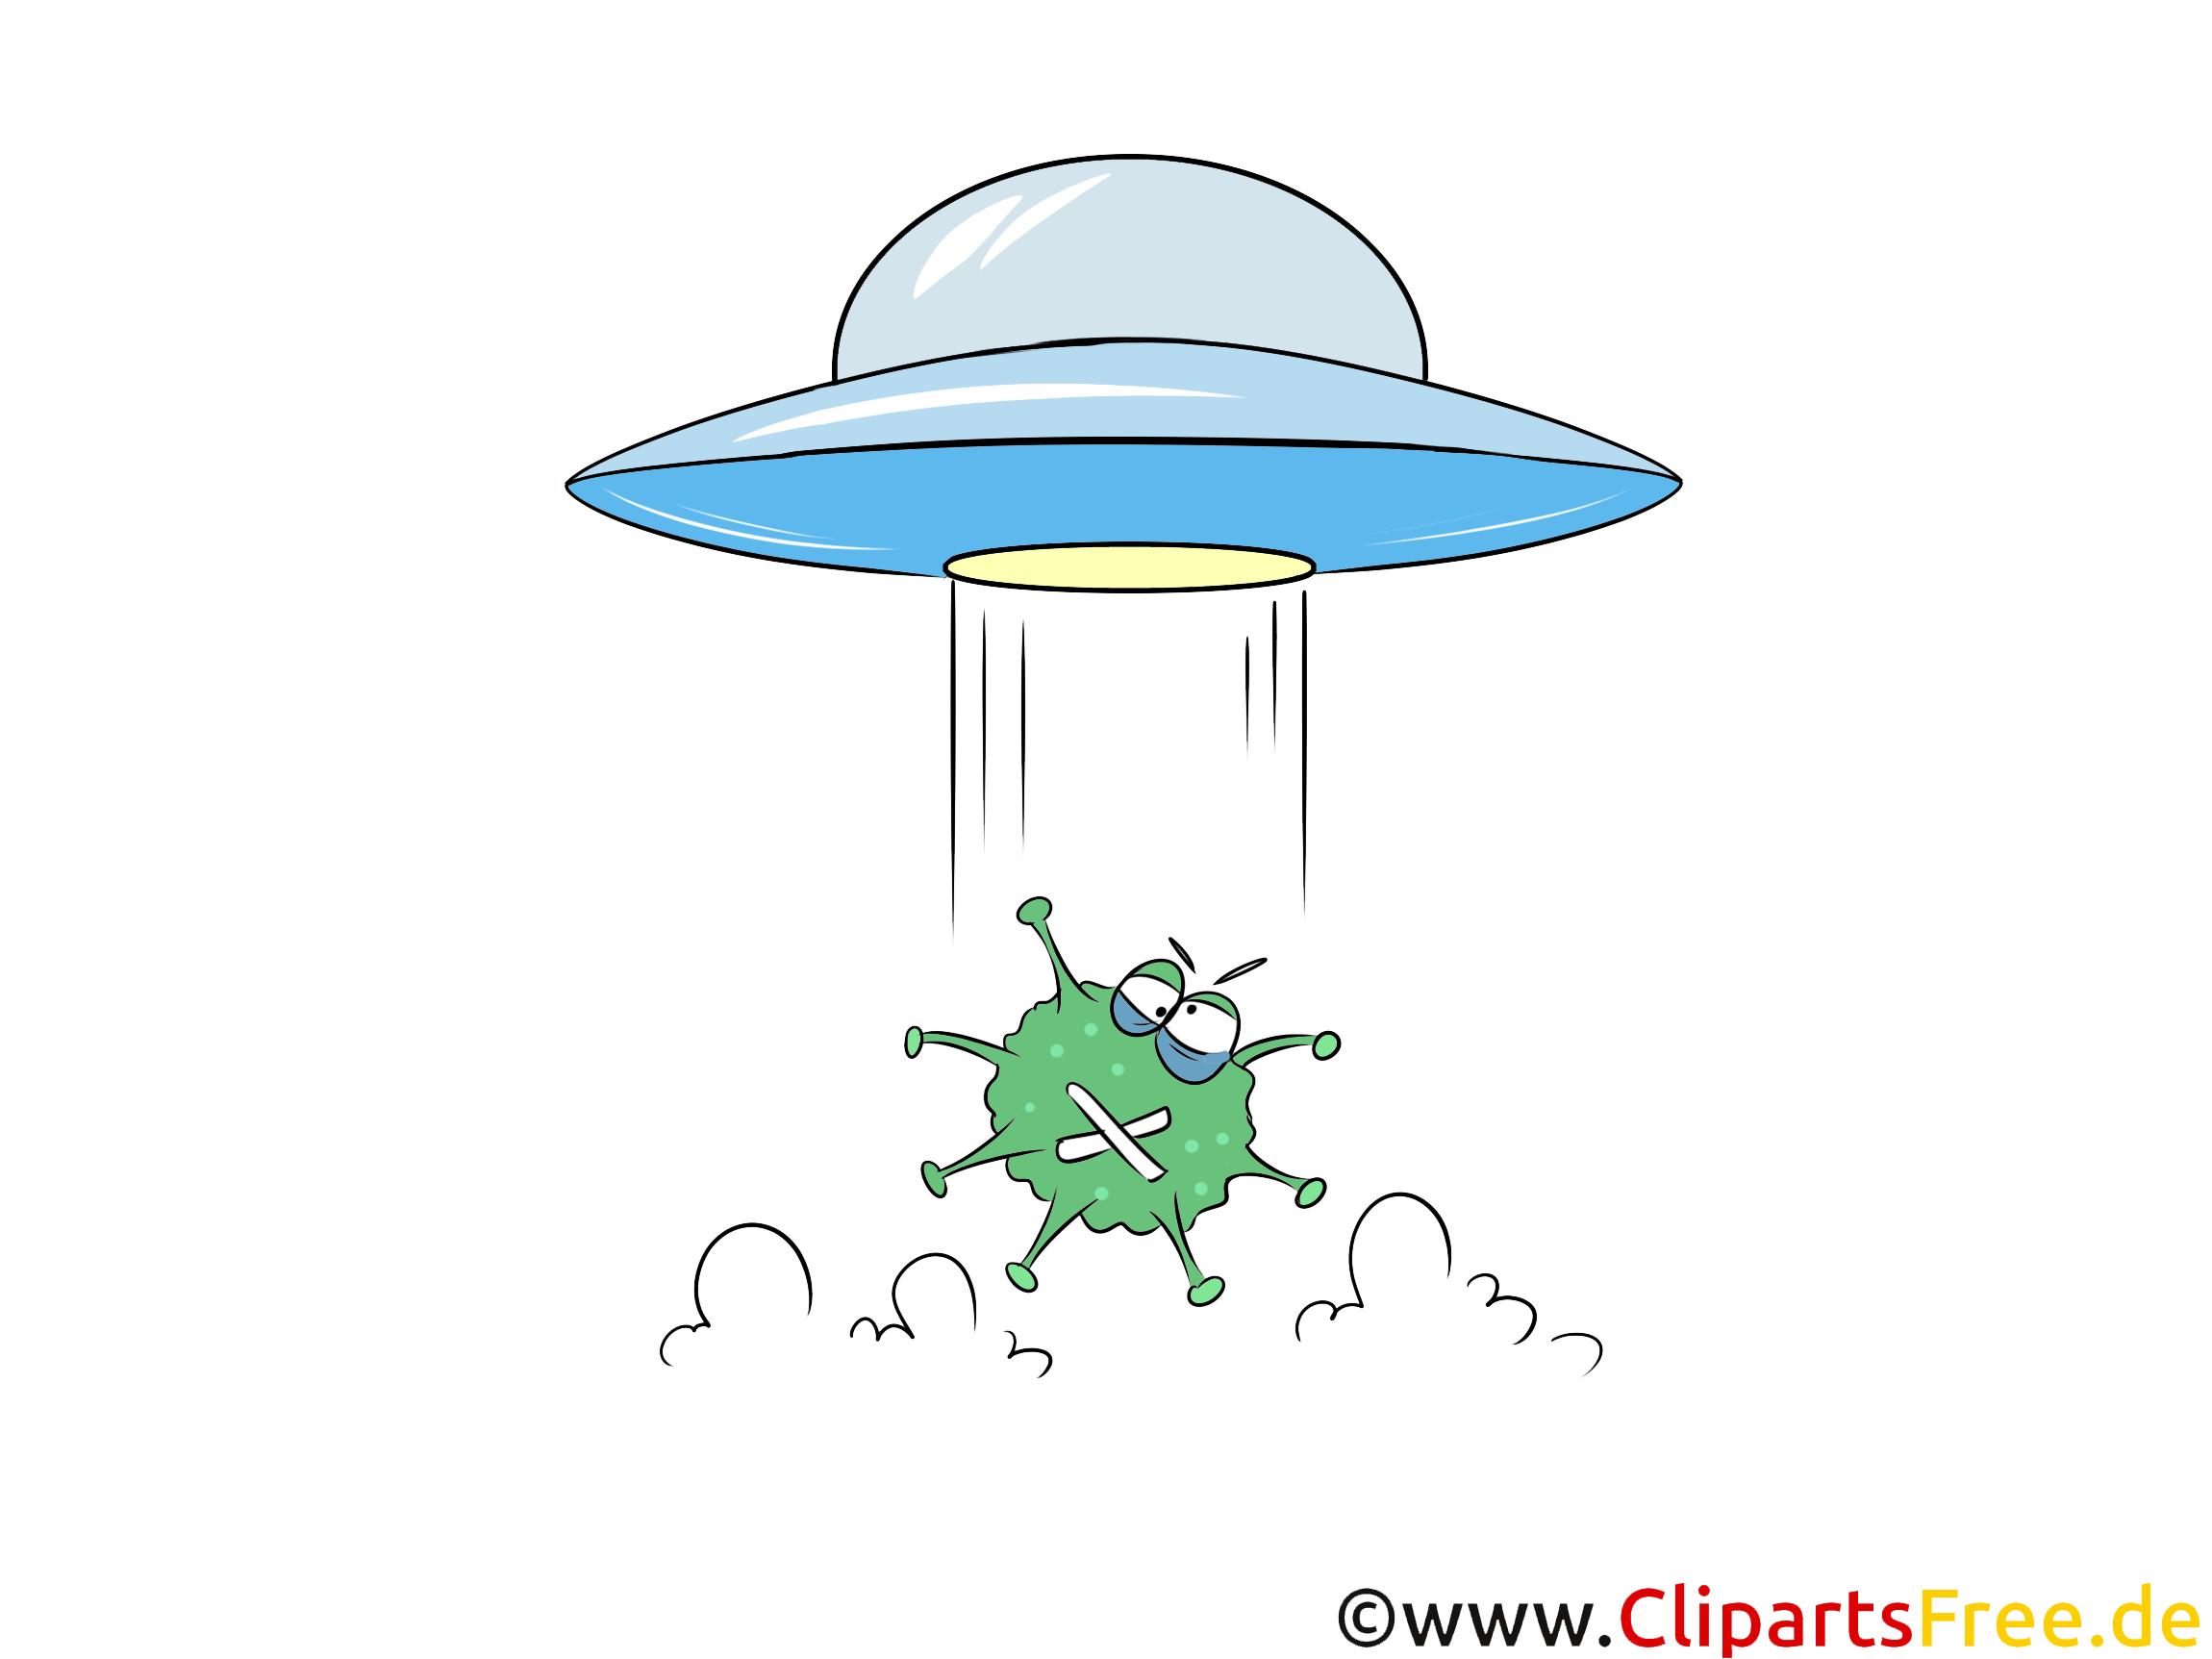 Ufo bringt Virus, Bakterien - Verschwörungstheorien - Illustration, Cartoon, Comic